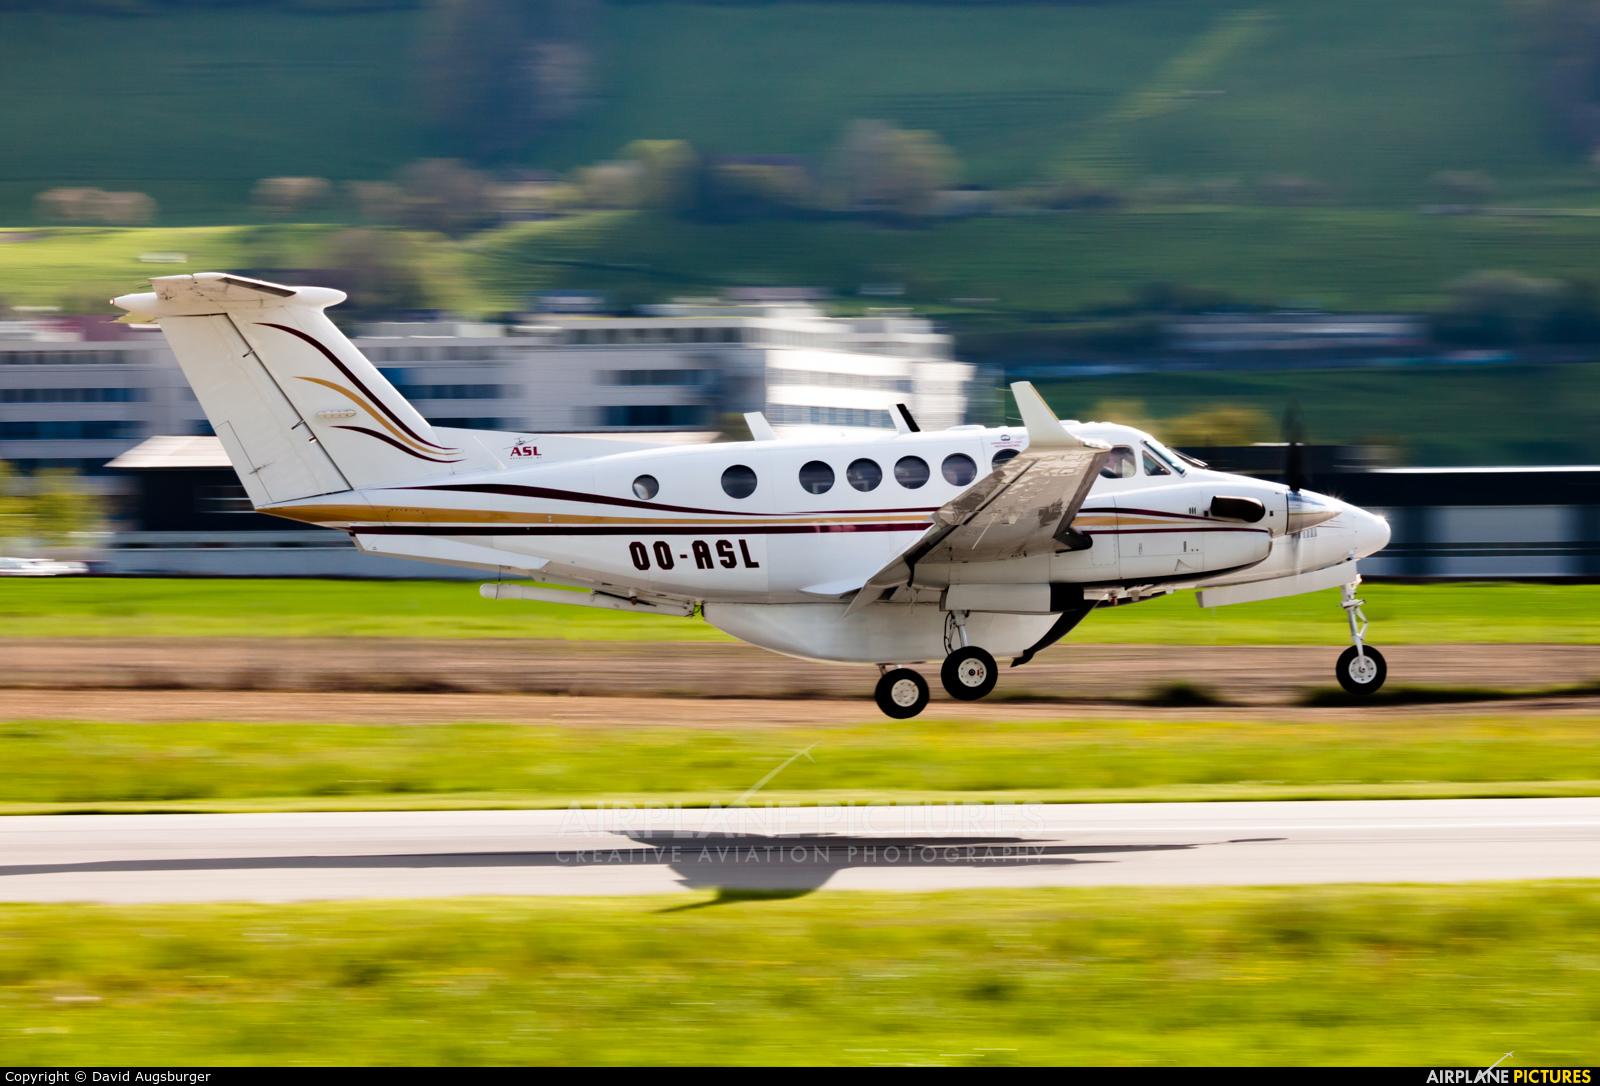 Air Service Liege OO-ASL aircraft at Bern - Belp